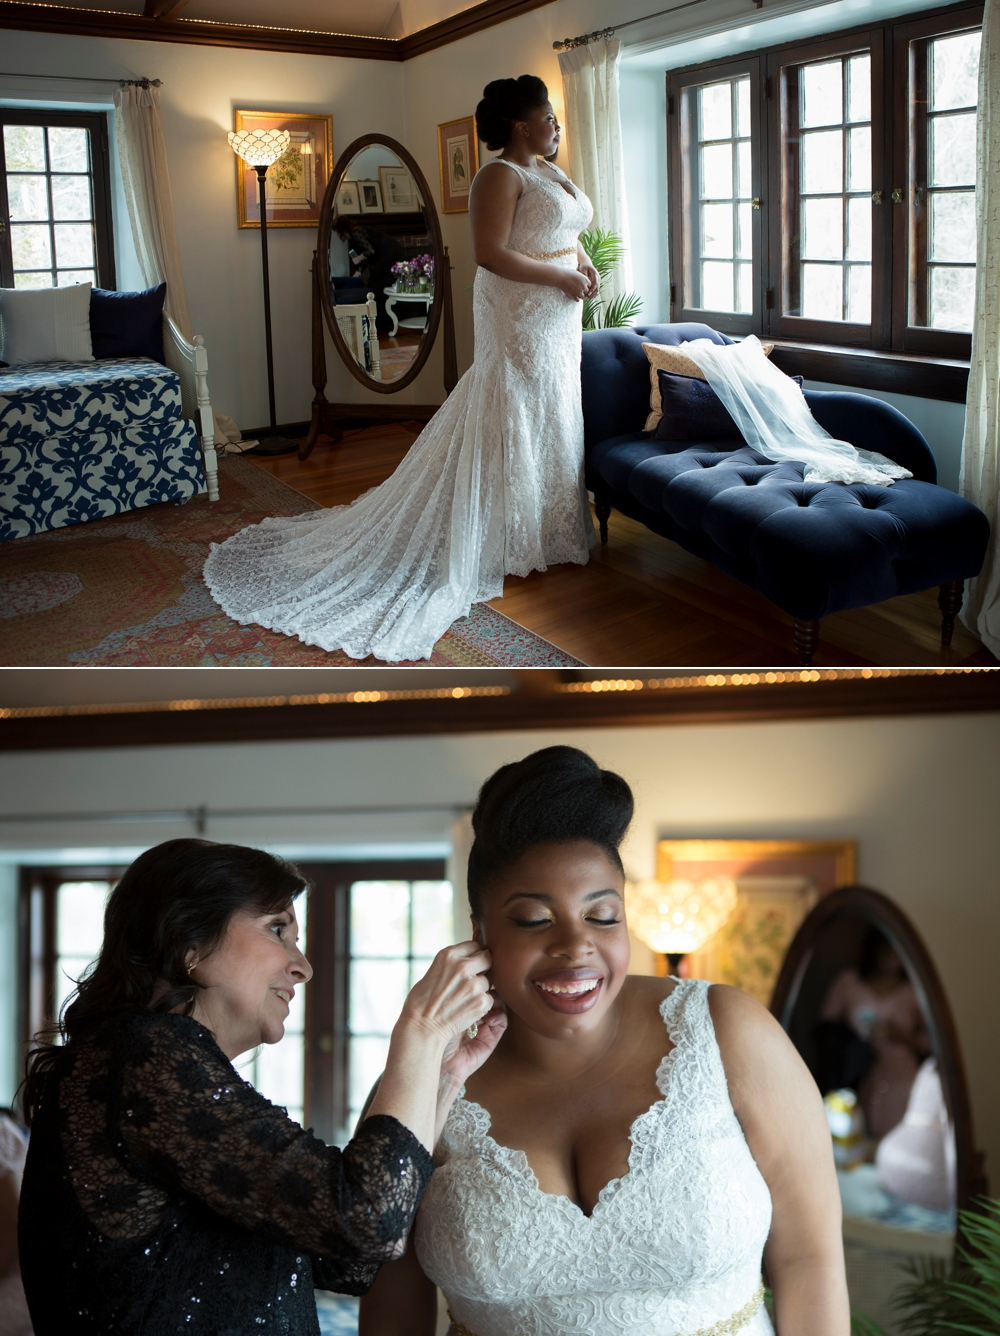 SomerbyJonesPhotography_WillowdaleWedding_Willowdale_Wedding_0016.jpg